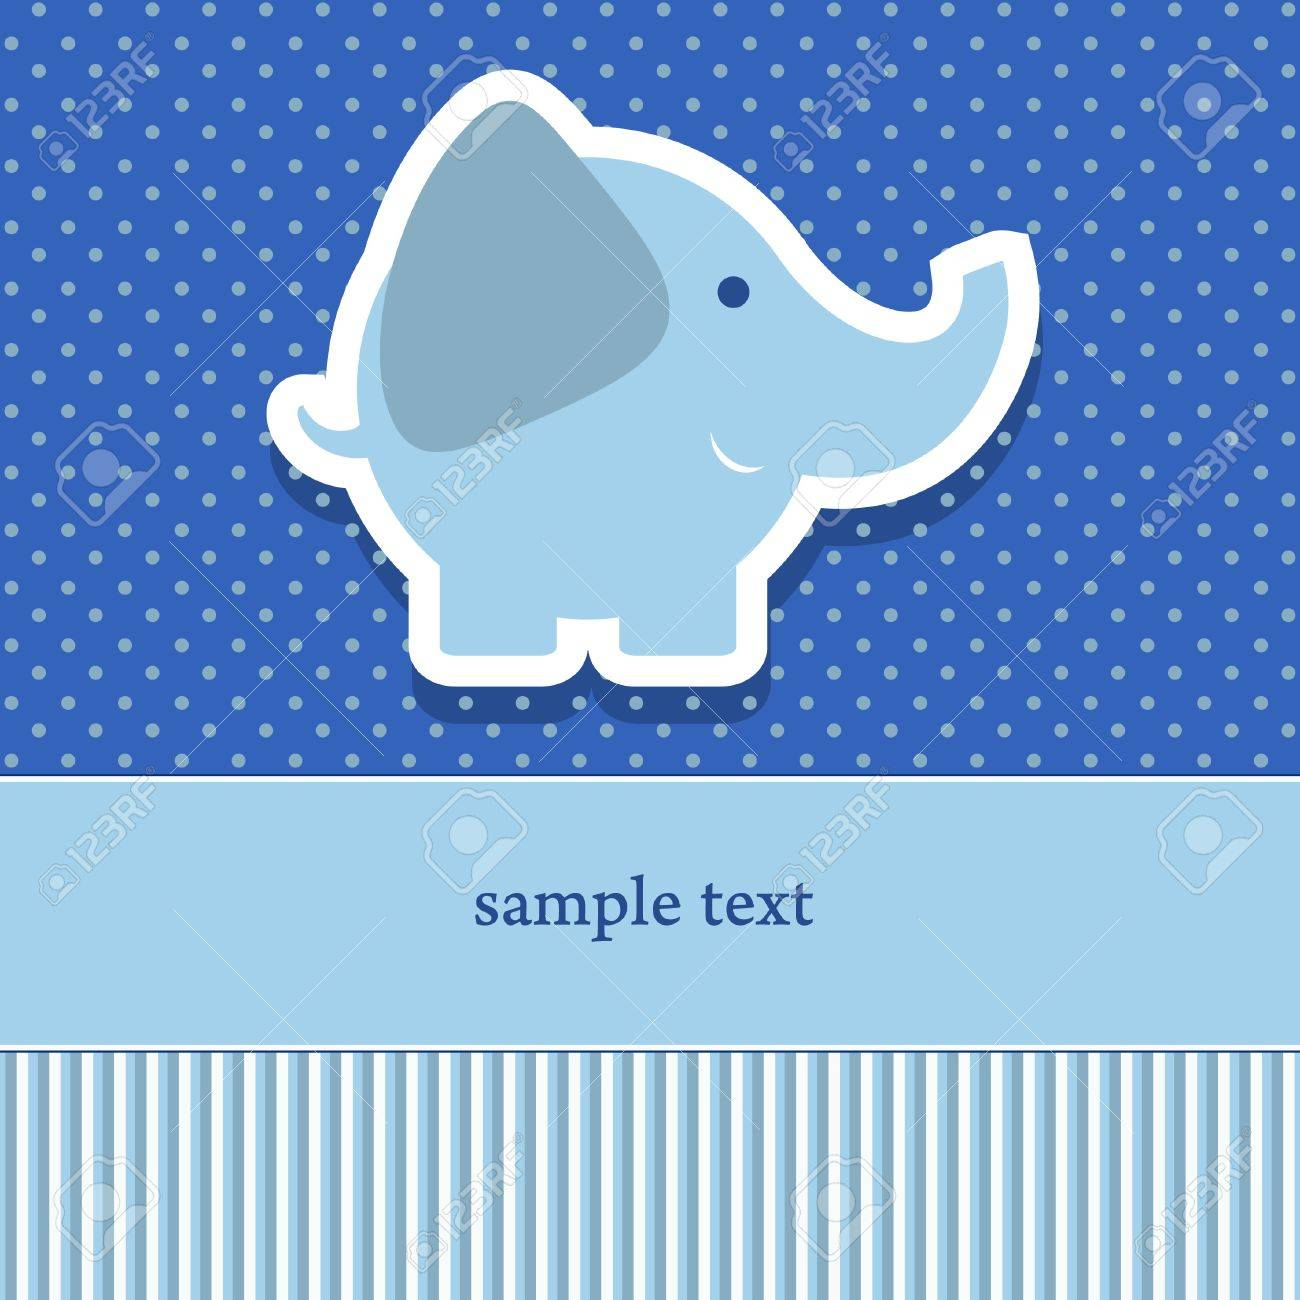 baby shower invitation template  illustration  Cute elephant Stock Vector - 18781817